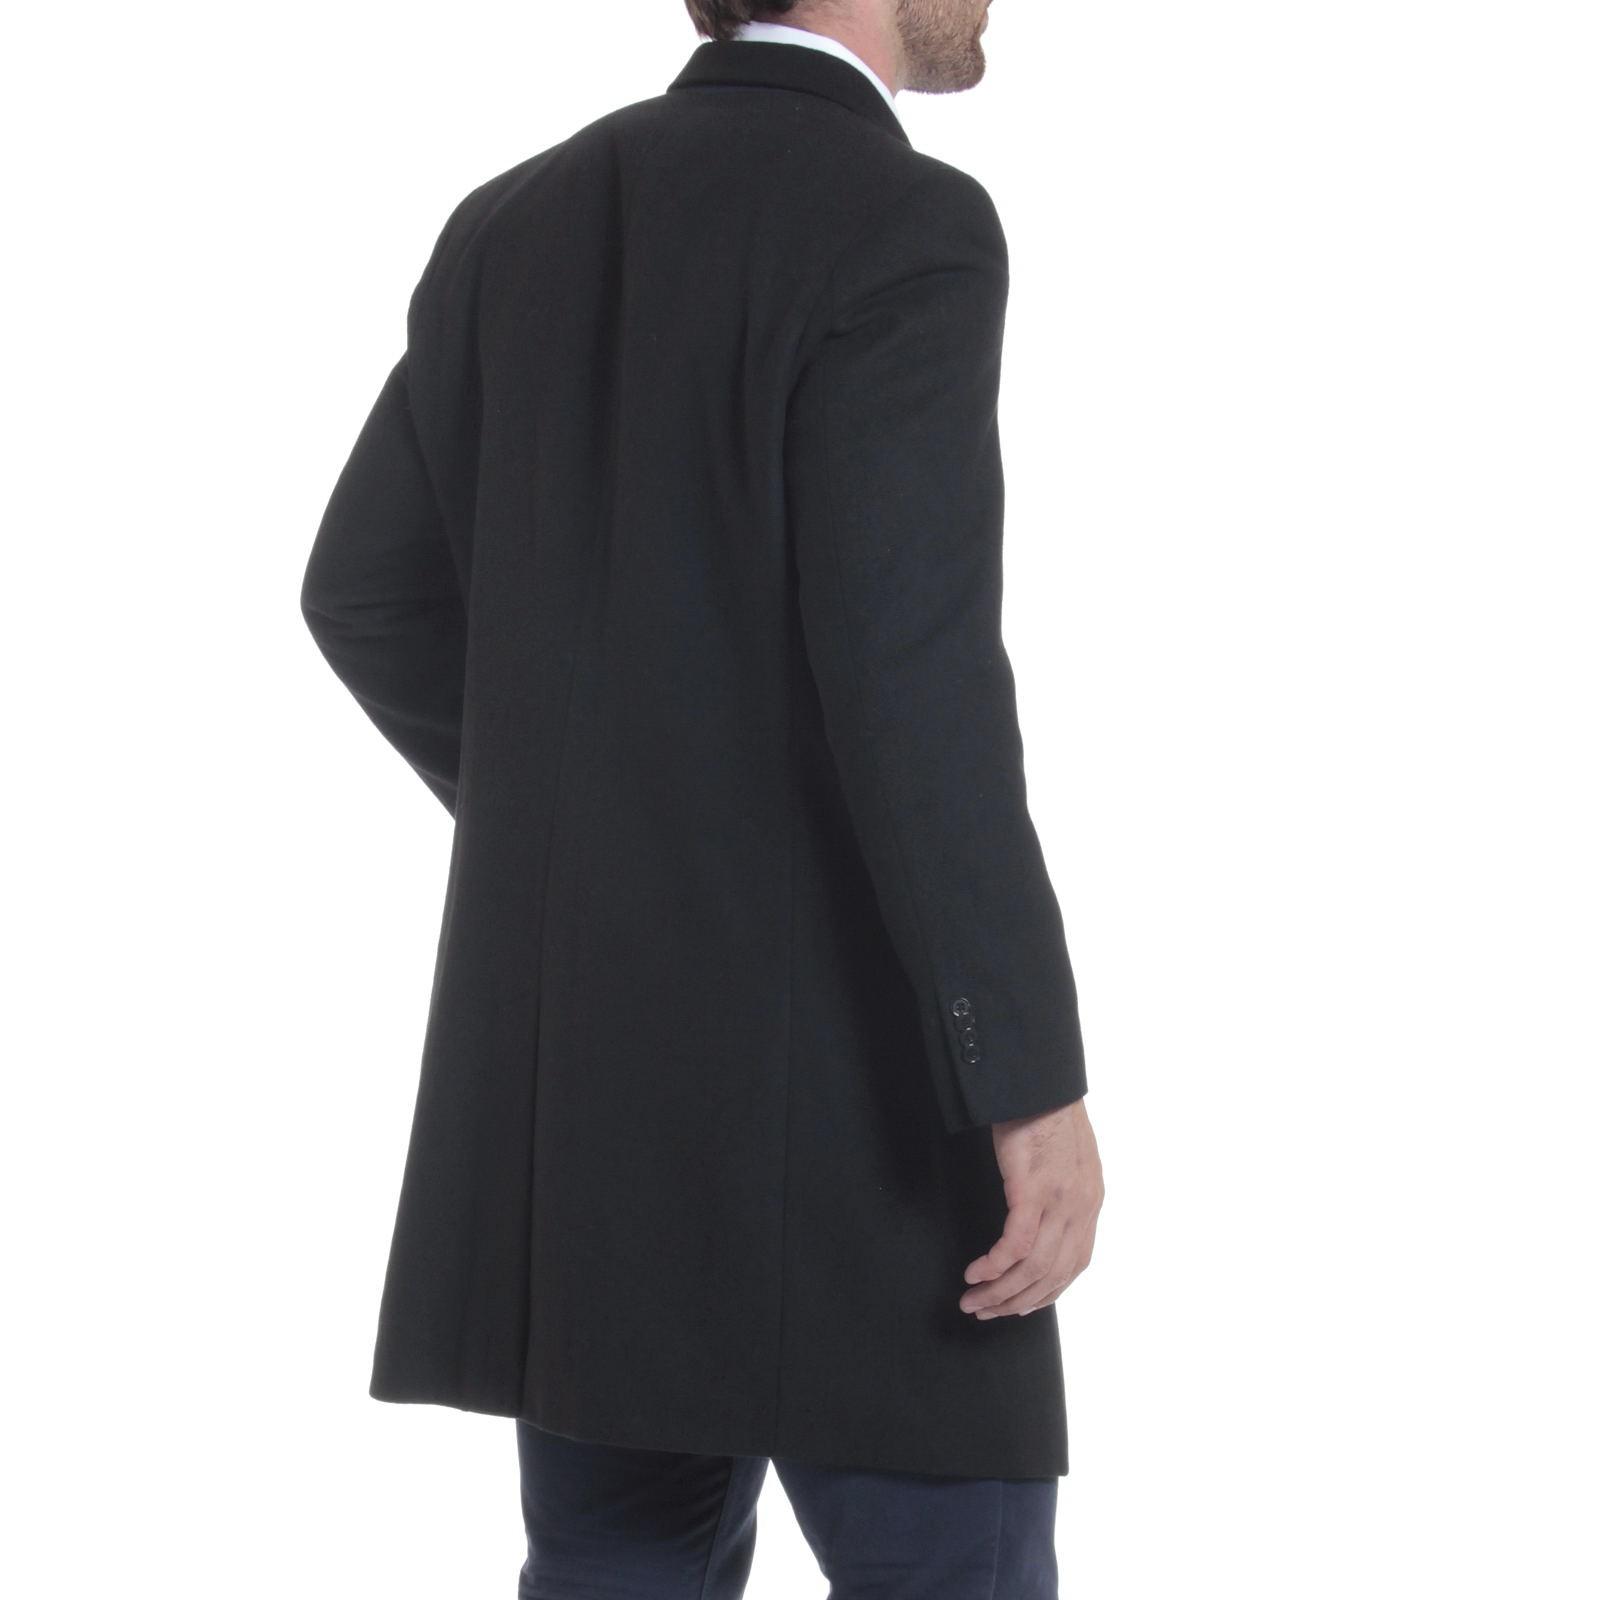 nameless ghoul coat. alpine-swiss-luke-wool-mens-tailored-37-walker- nameless ghoul coat l